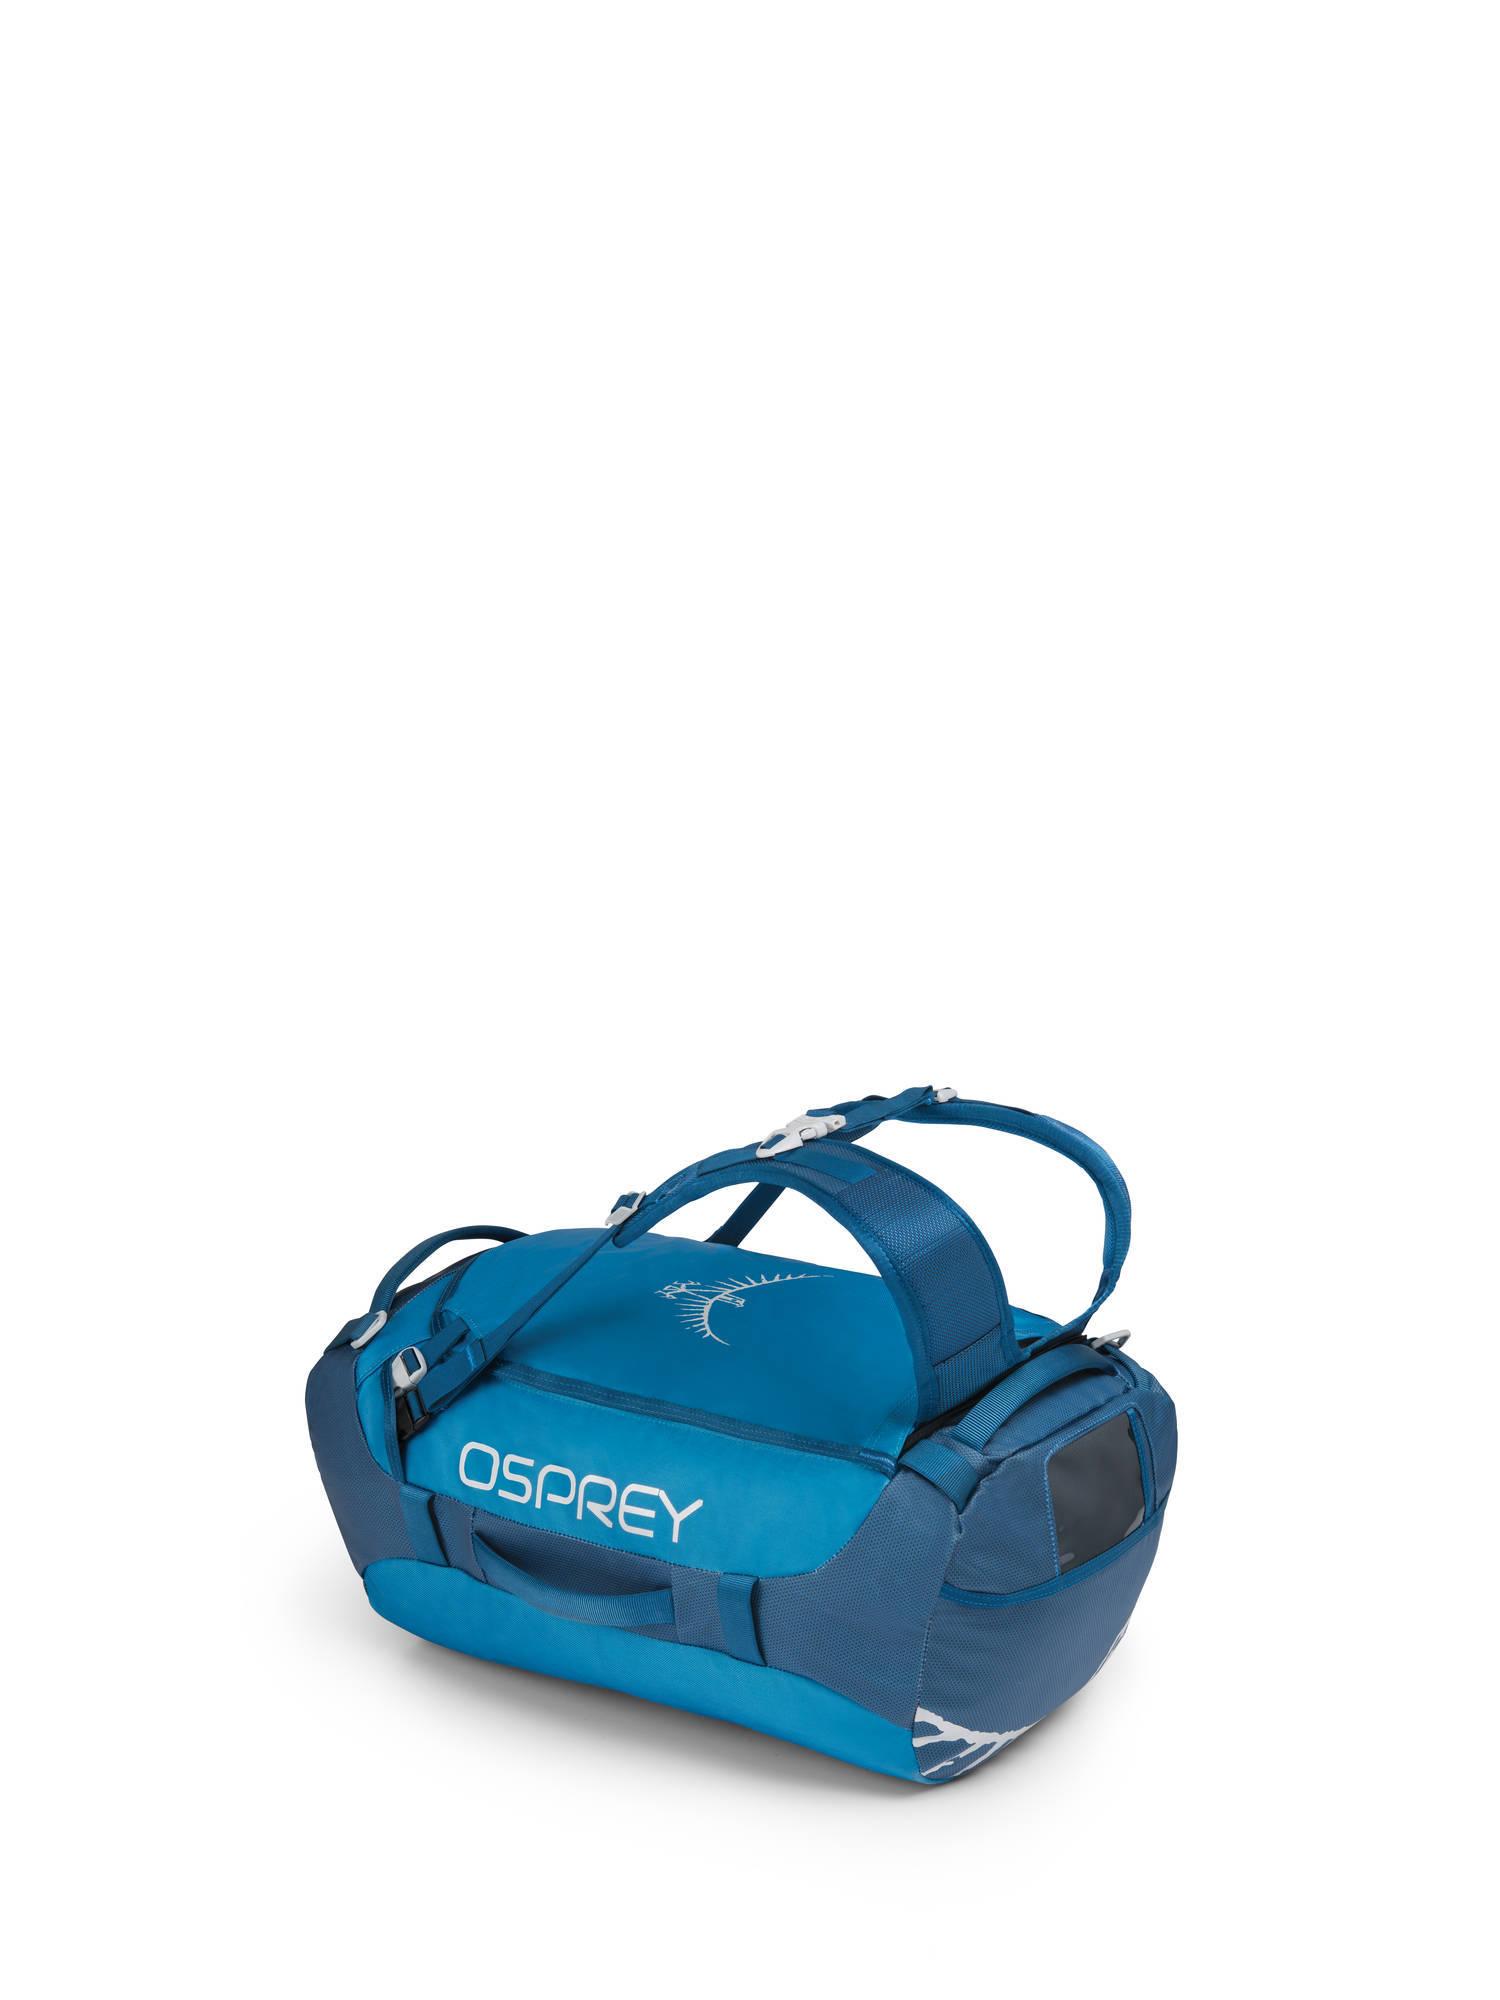 Сумки-рюкзаки Сумка-рюкзак Osprey Transporter 40 Kingfisher Blue Transporter_40_F17_Side_Kingfisher_Blue_web.jpg